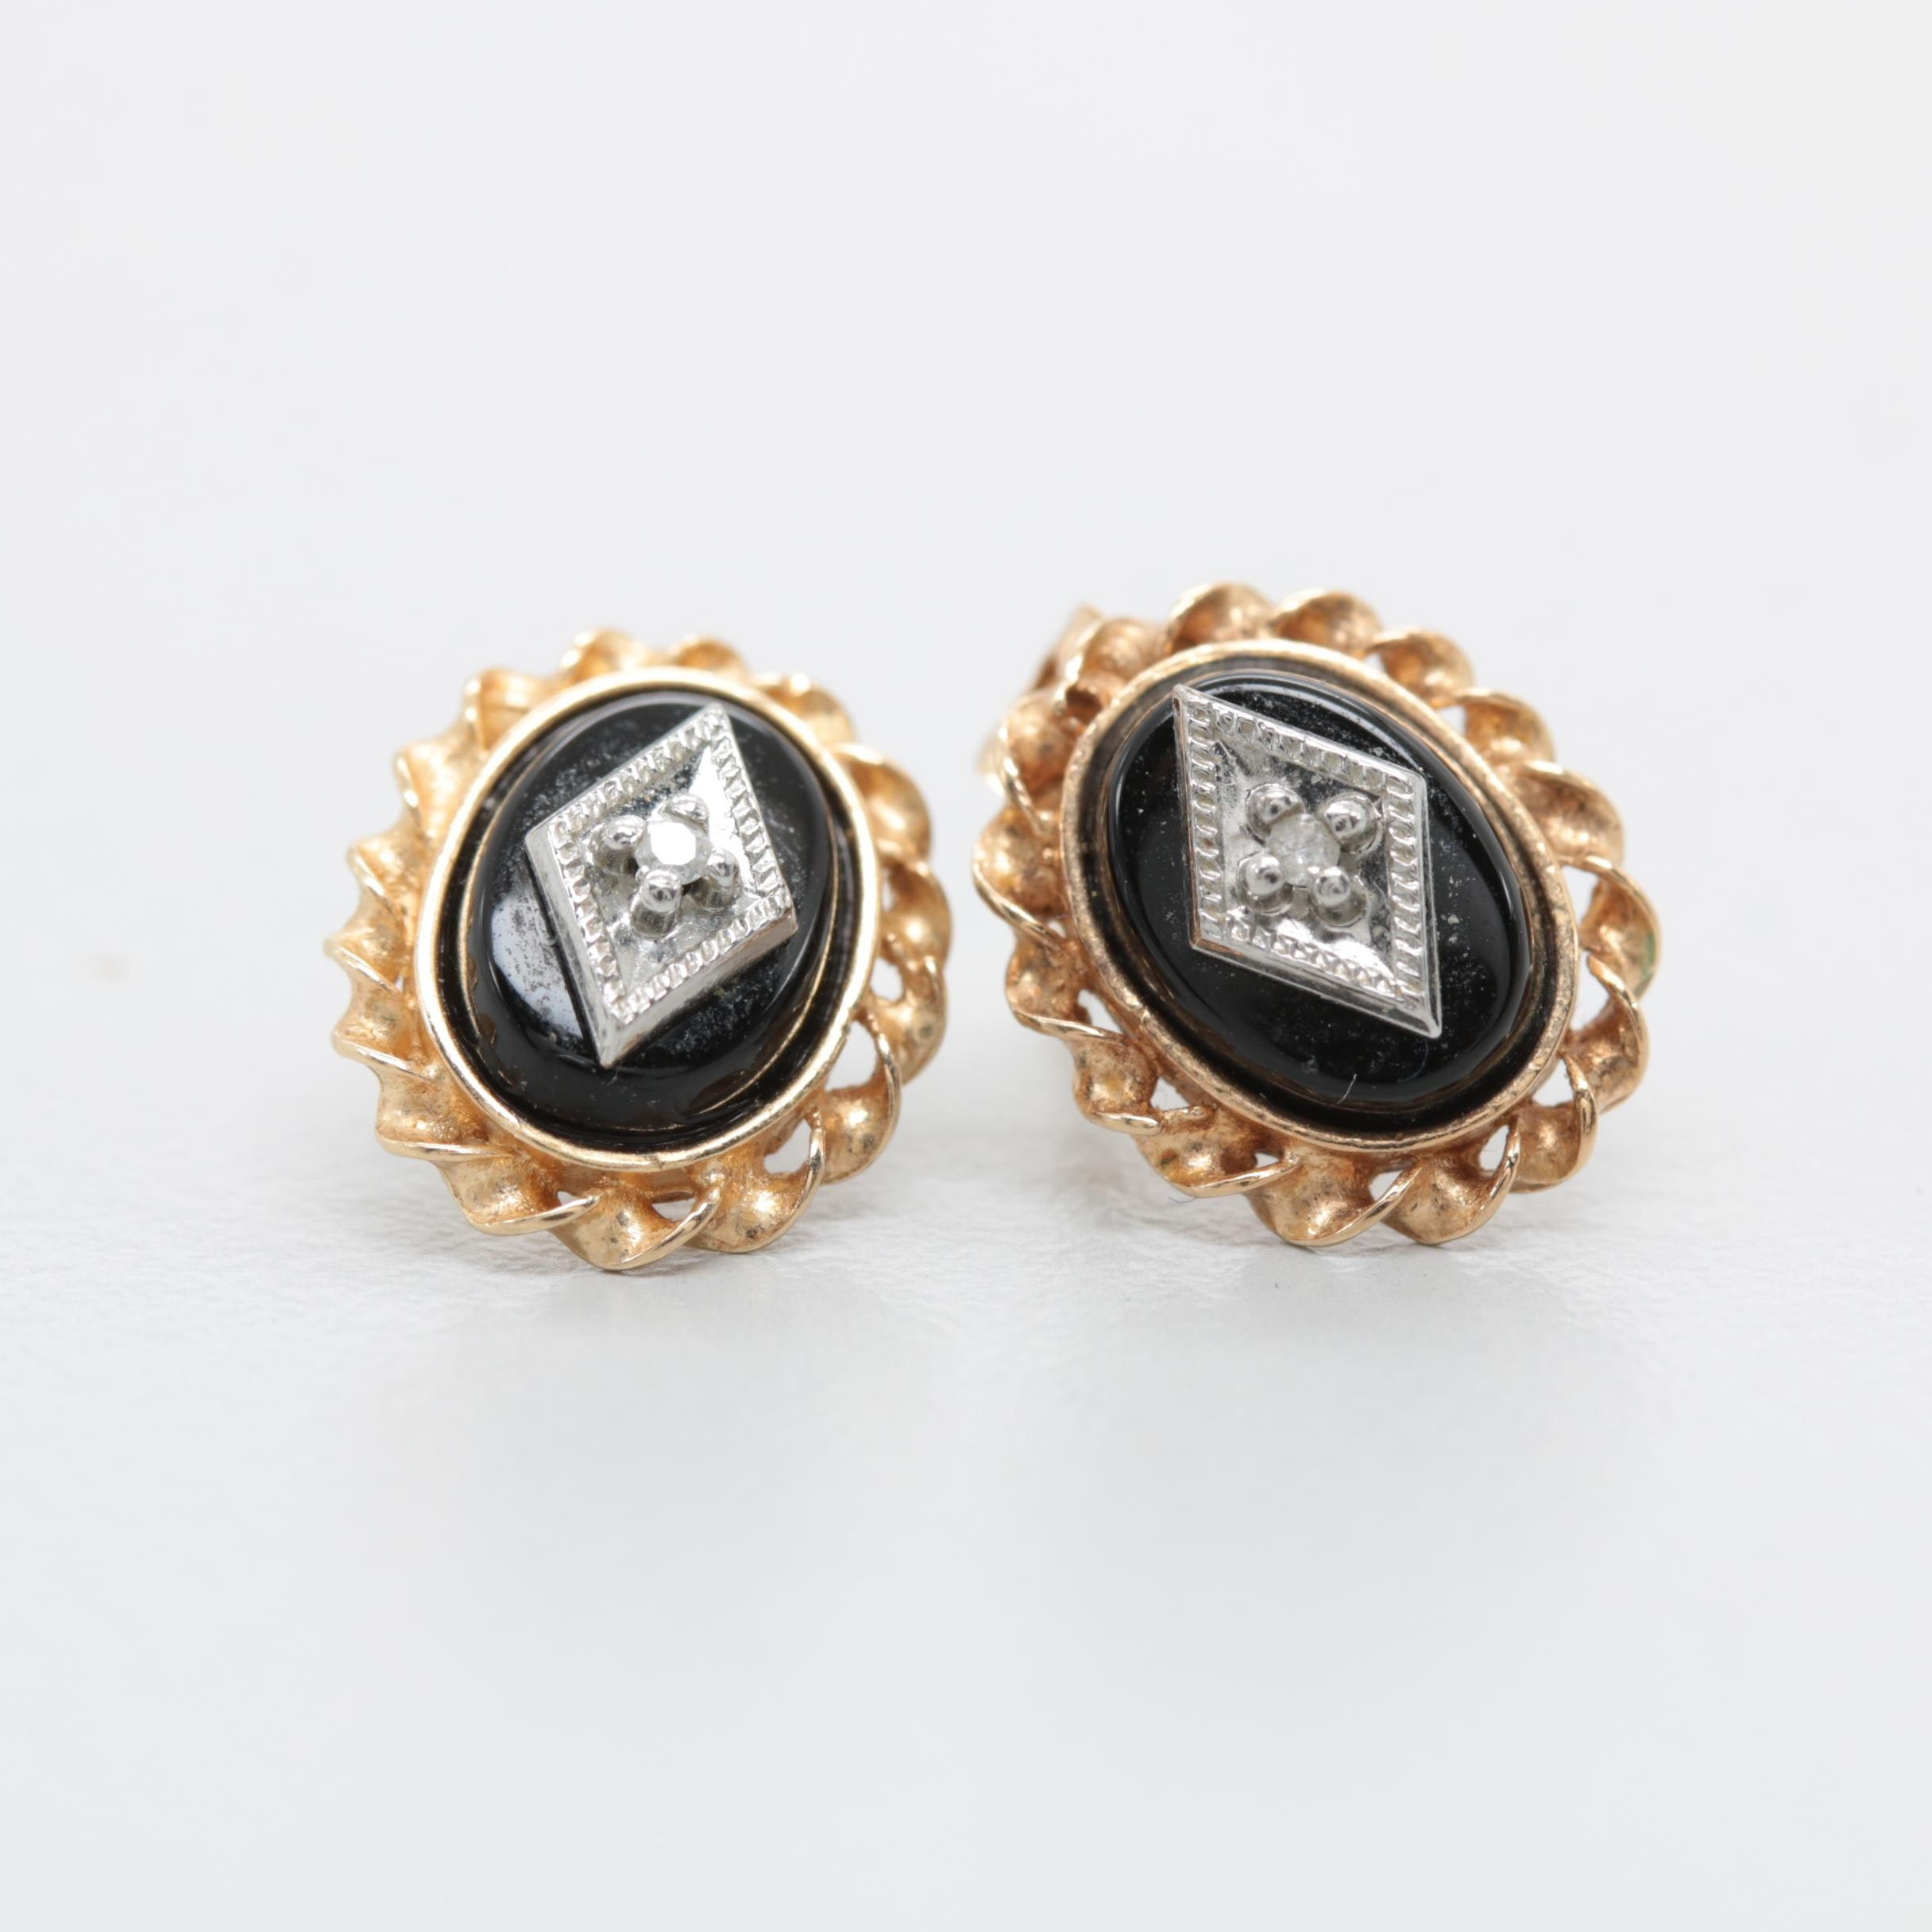 14K Yellow Gold Black Onyx and Diamond Earrings